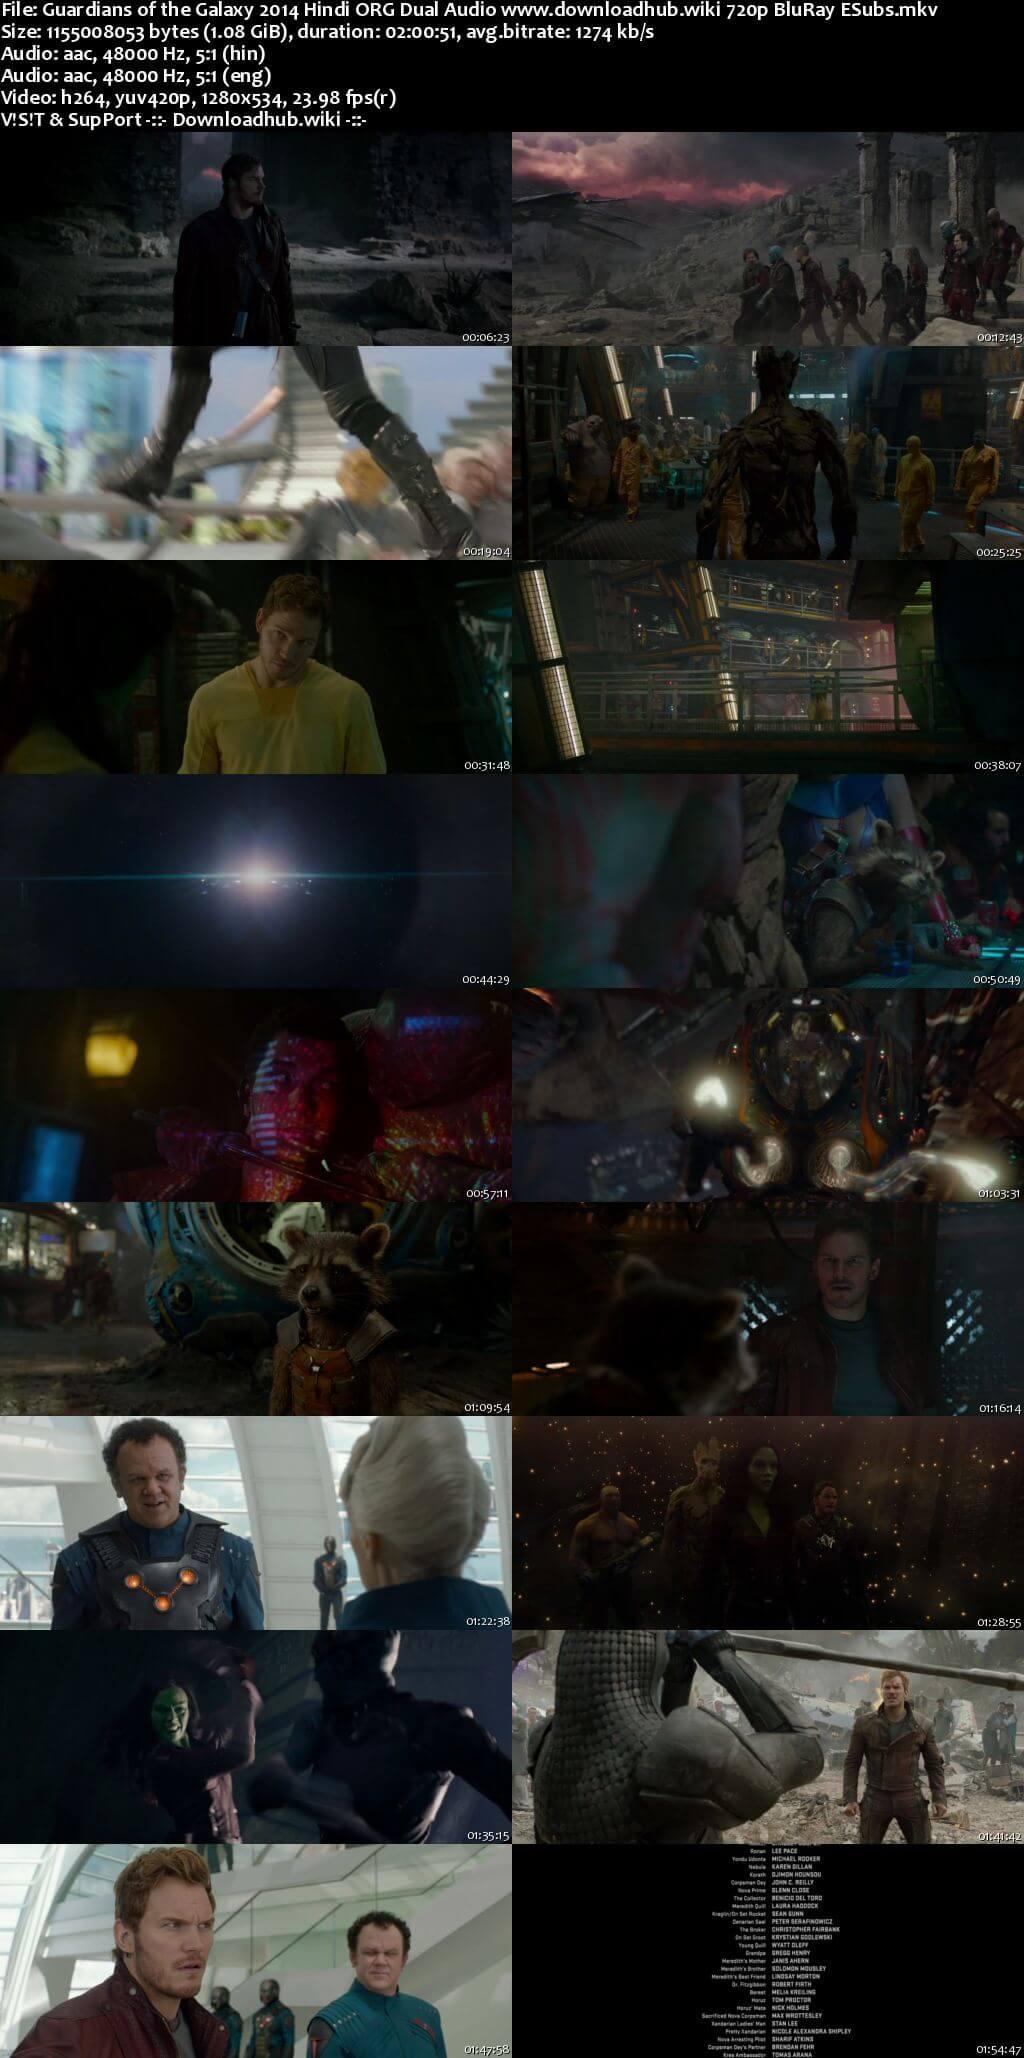 Guardians of the Galaxy 2014 Hindi ORG Dual Audio 720p BluRay ESubs